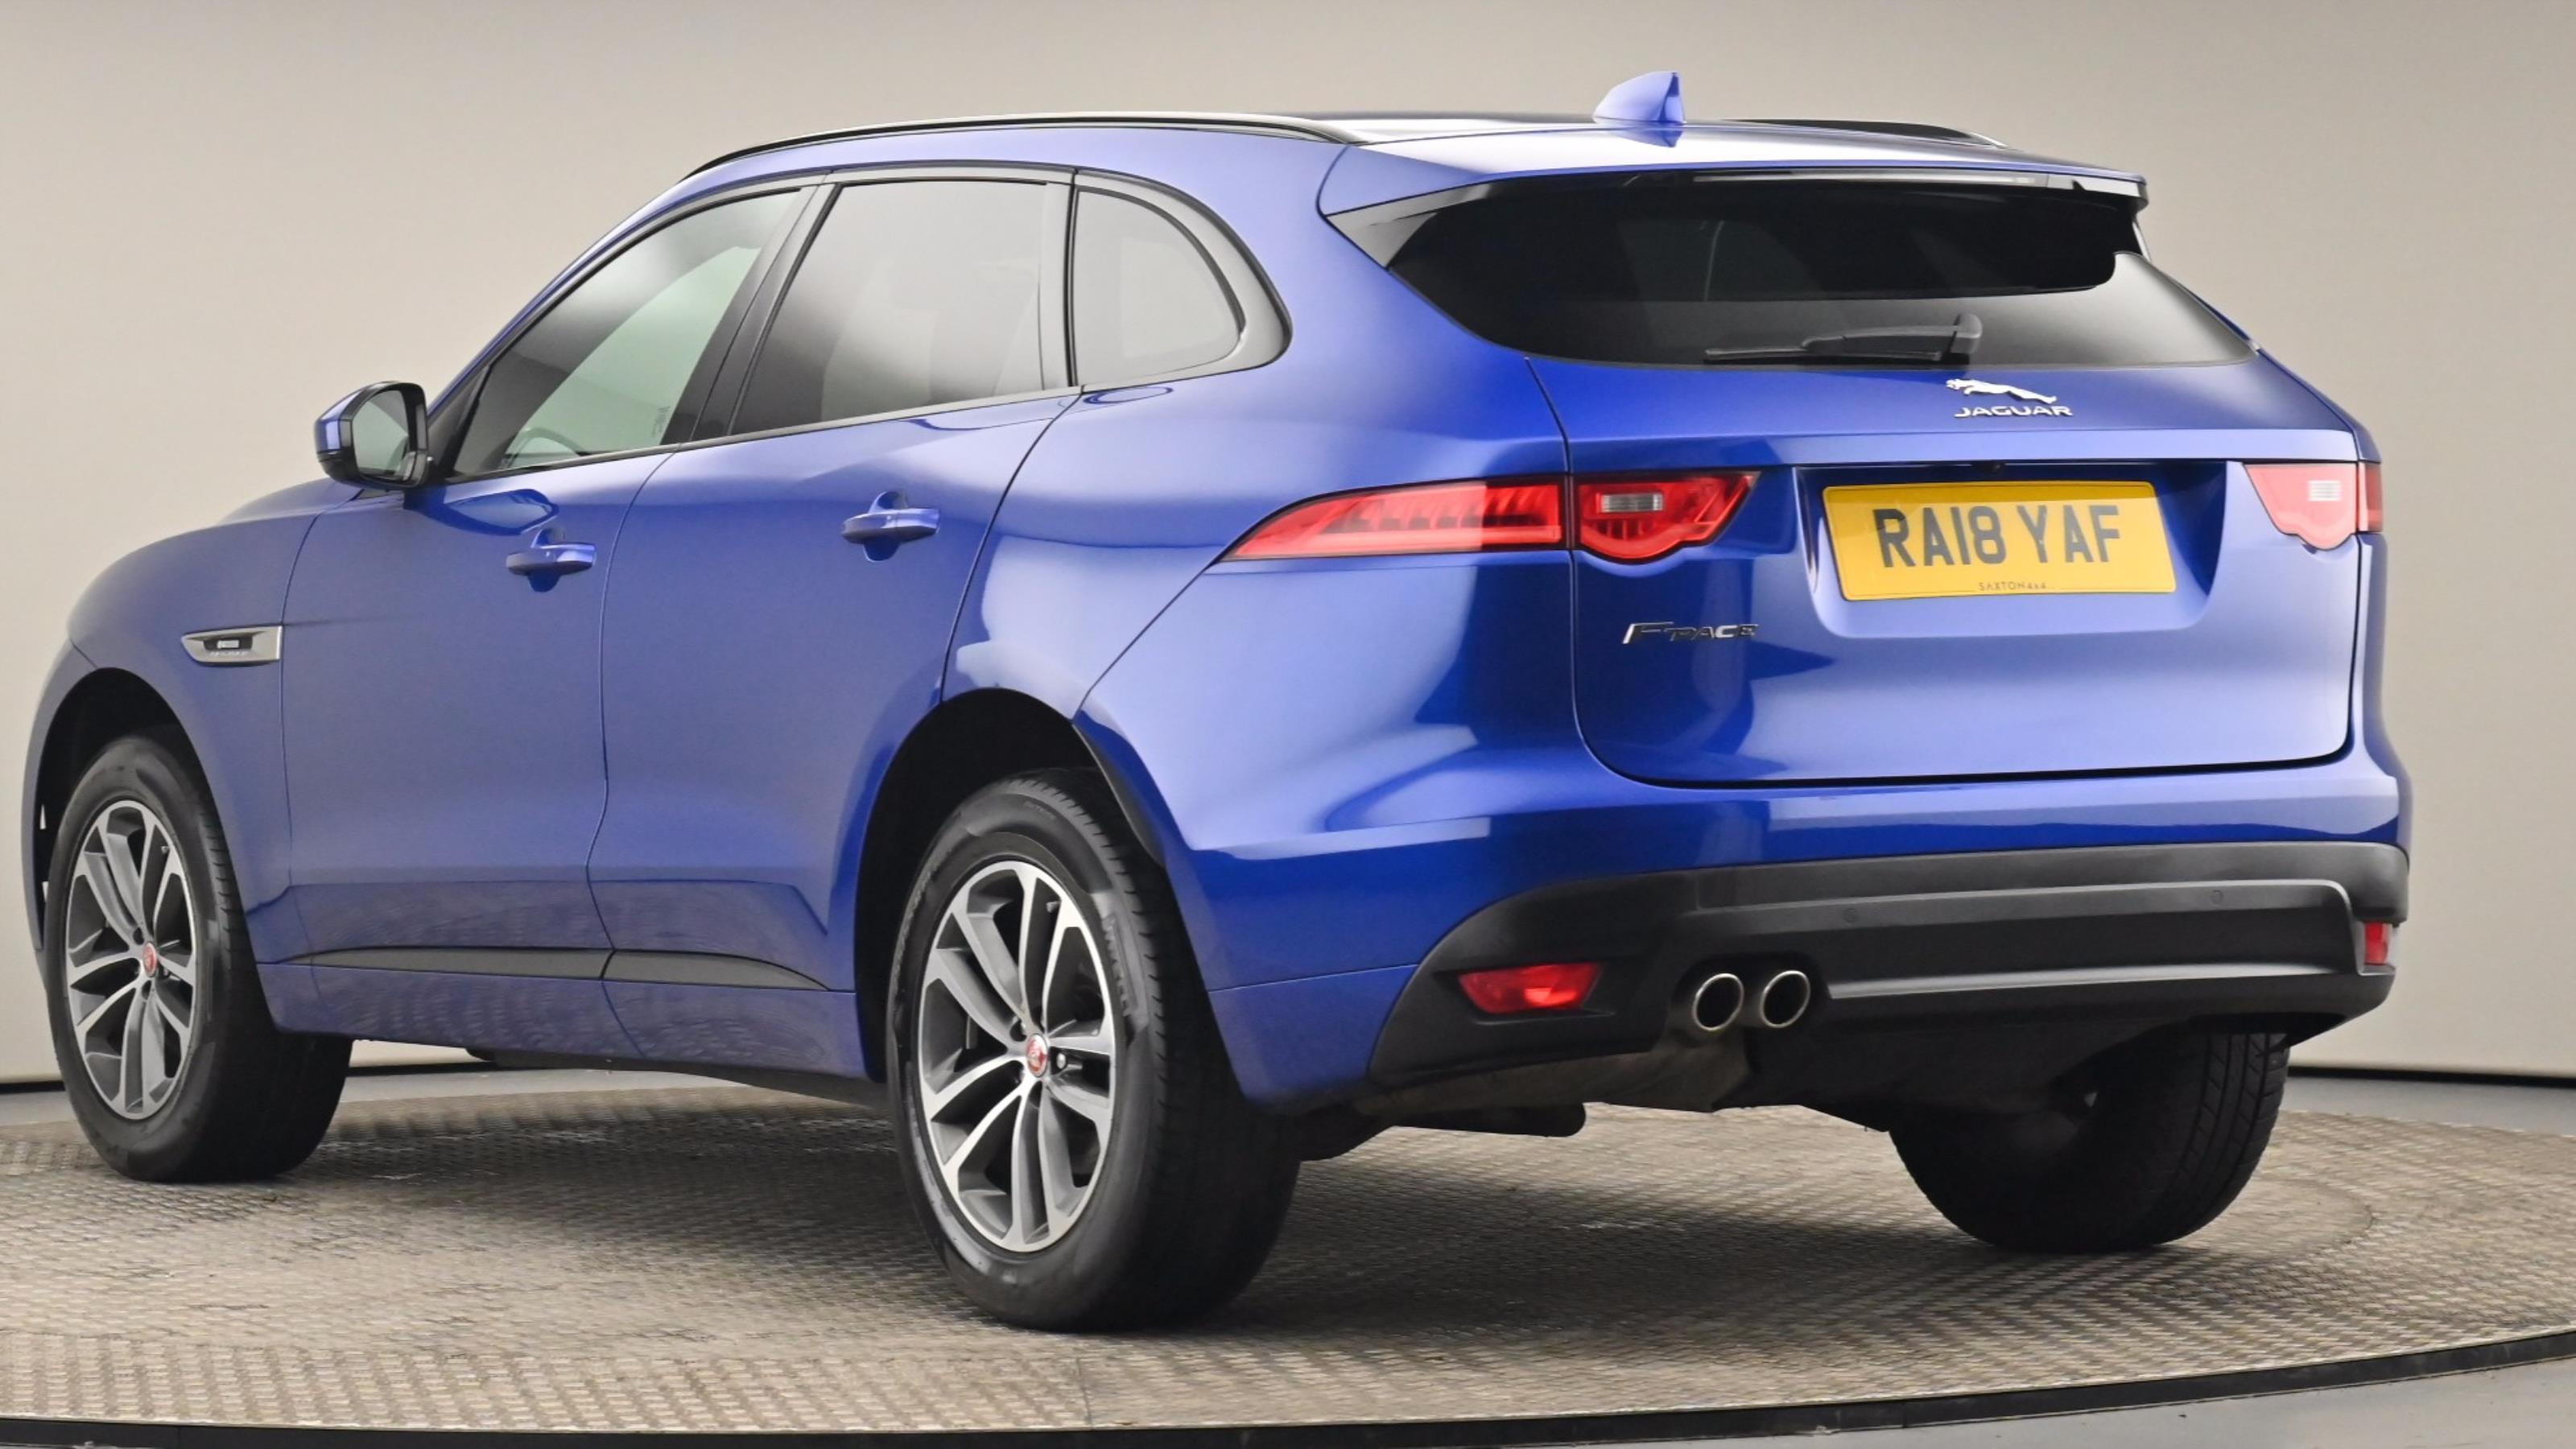 Used 2018 Jaguar F-PACE 2.0d R-Sport 5dr Auto AWD BLUE at Saxton4x4